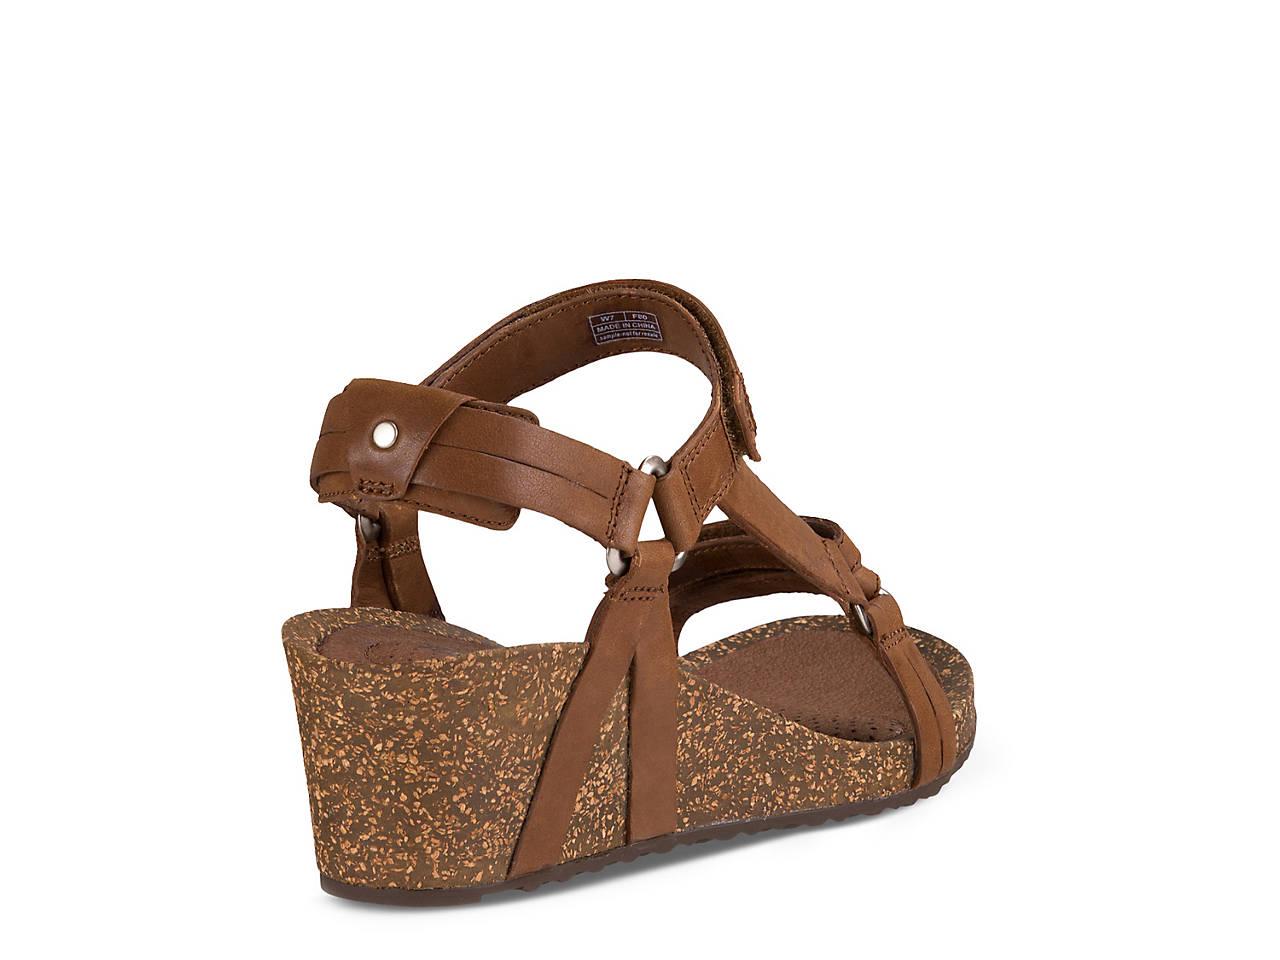 5805d51a1c00 Teva Ysidro Wedge Sandal Women s Shoes